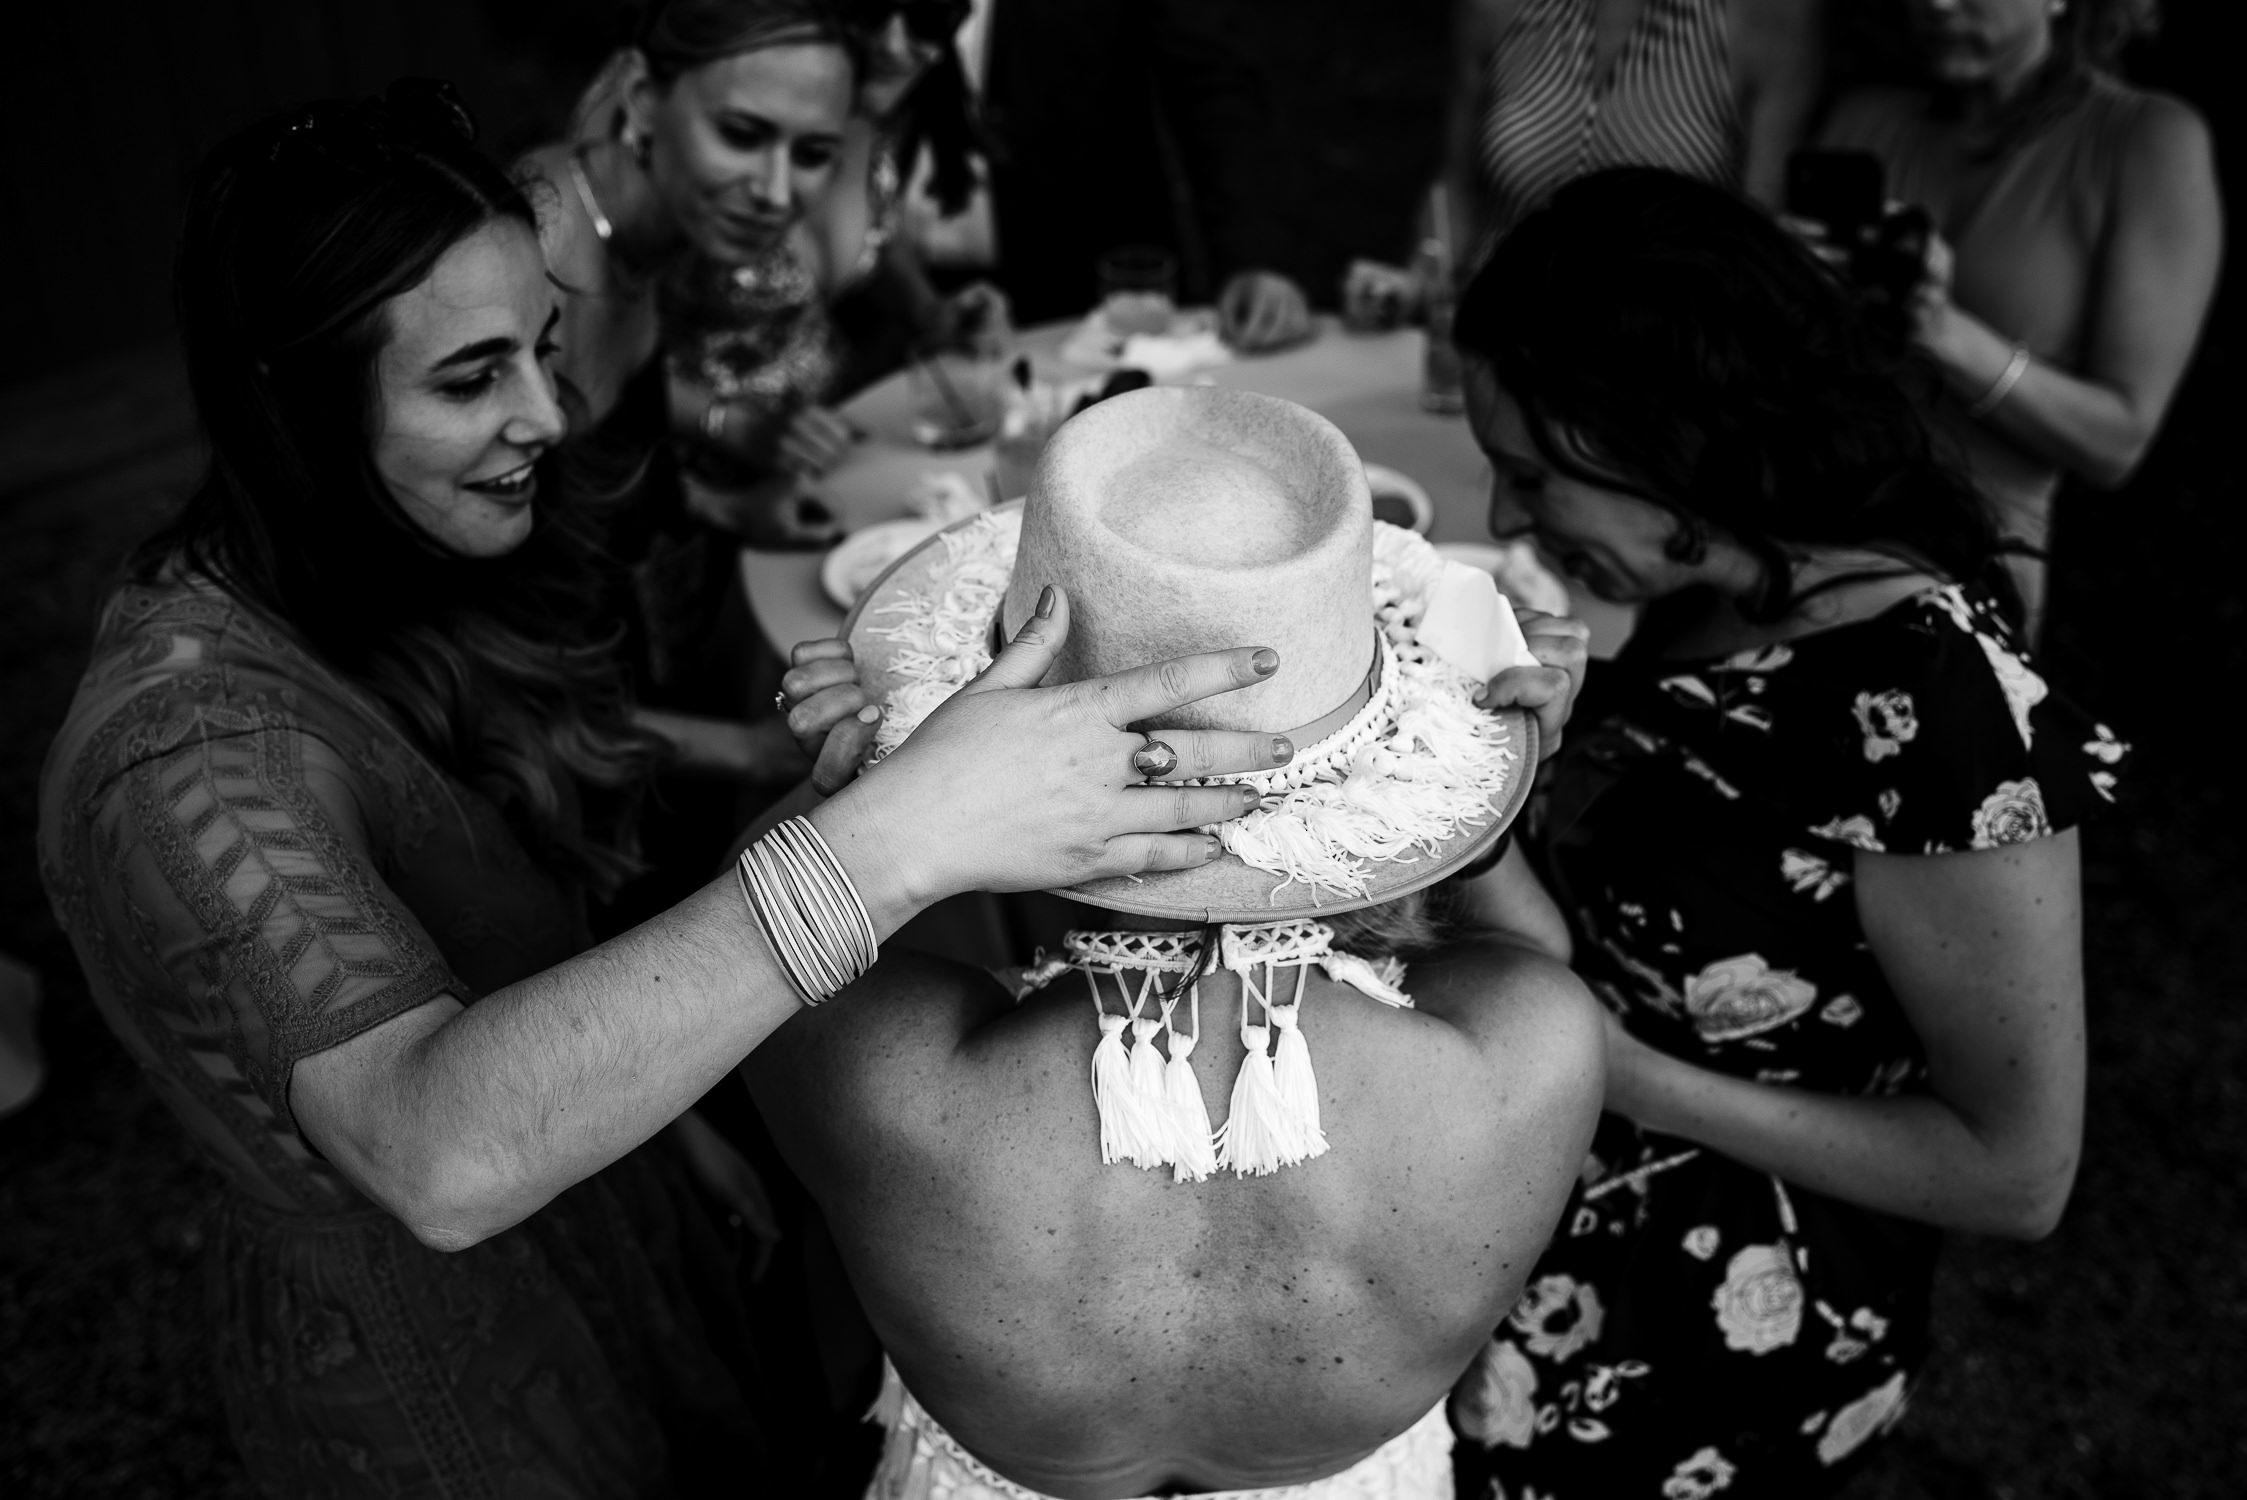 tourterelle-vermont-wedding-photographers-025-2-2247x1500.jpg